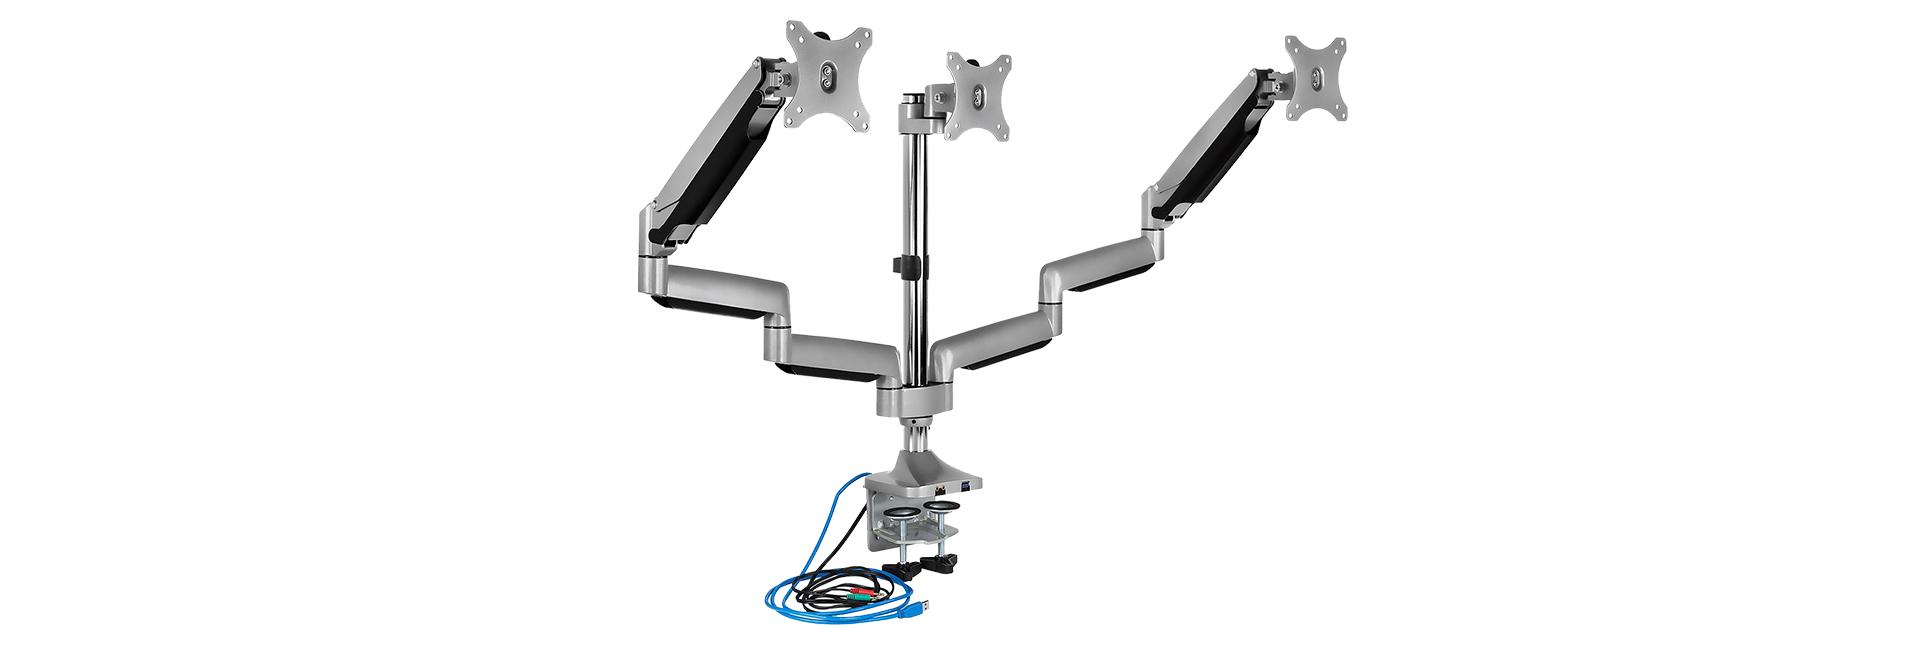 IcyBox trojni namizni nosilec za monitorja do diagonale 32''